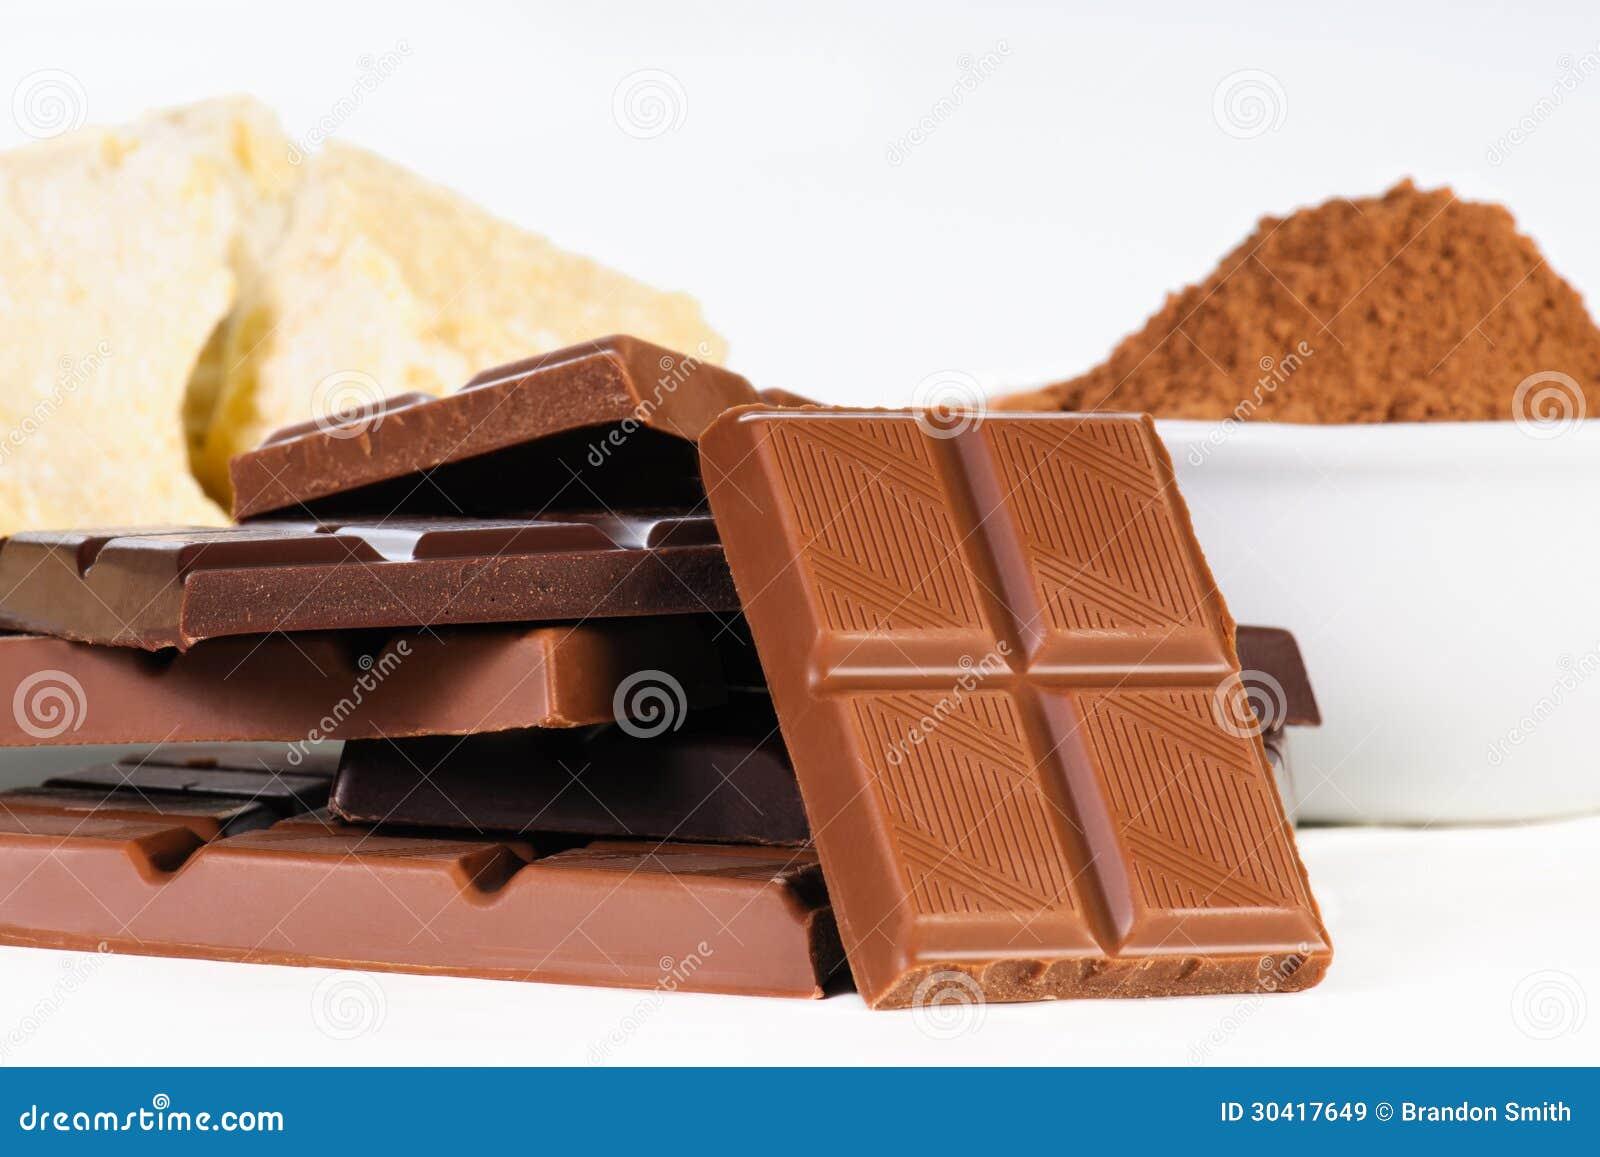 chocolate stock image image of milk cream caffeine